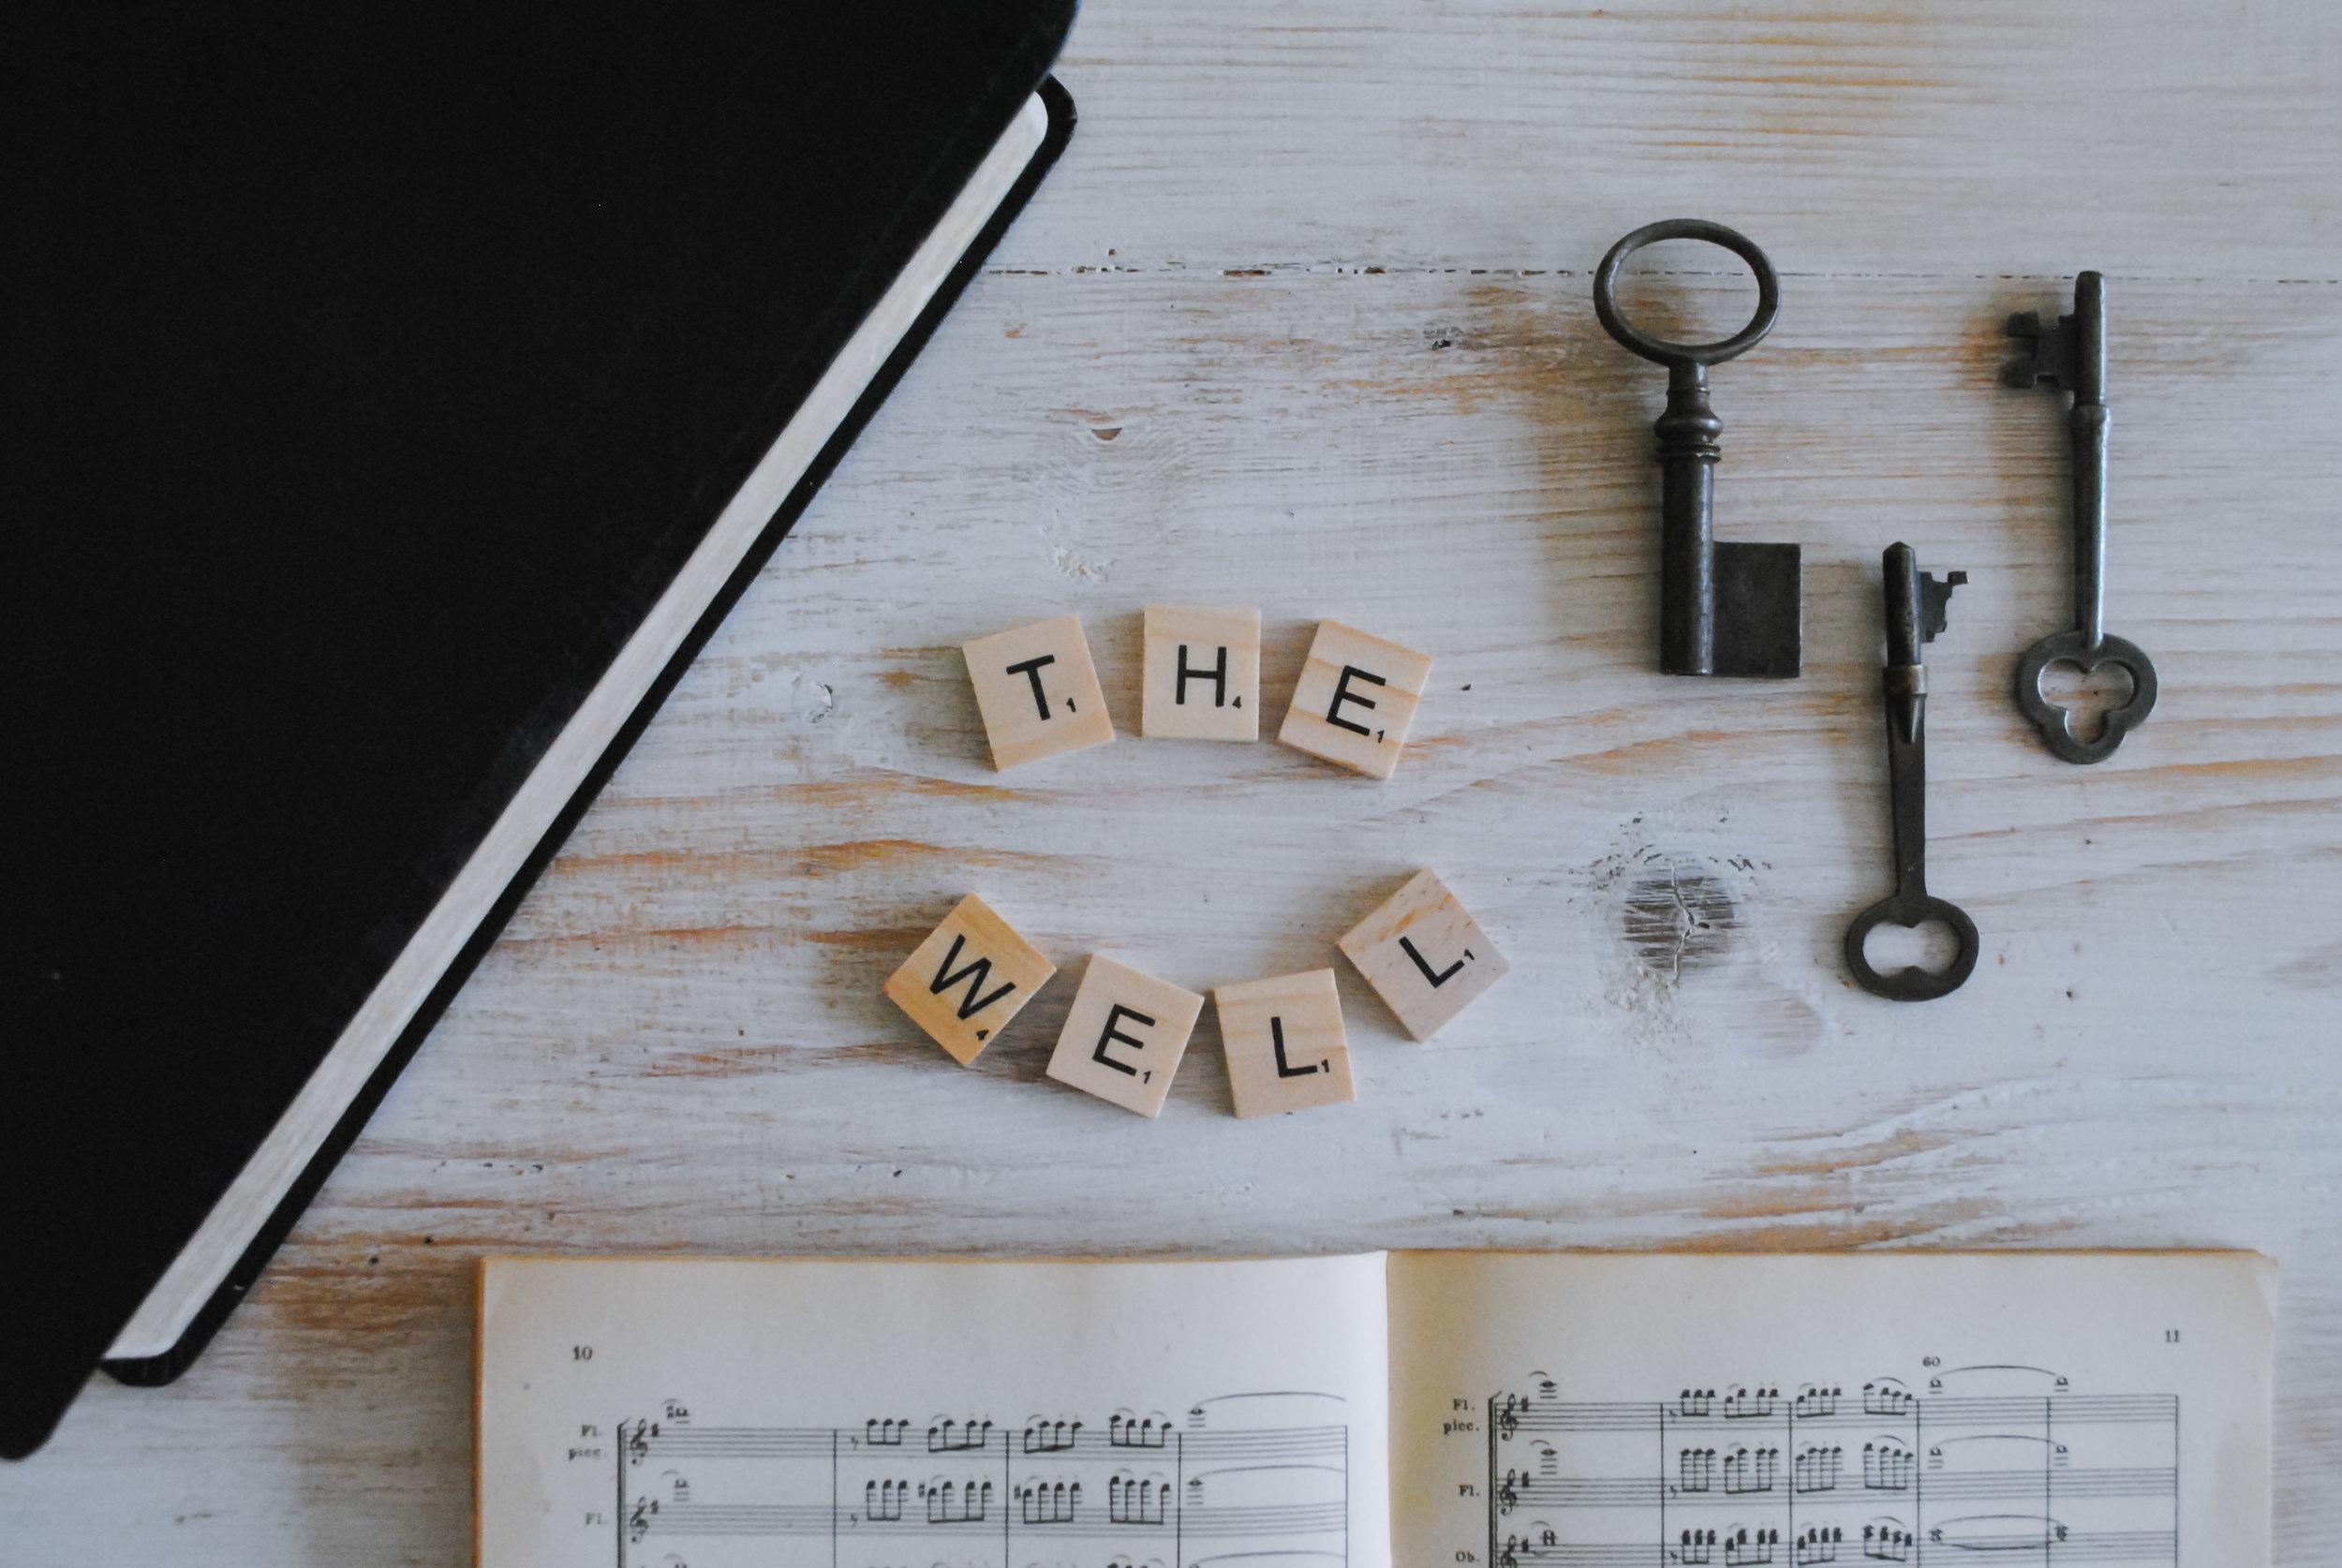 thewell-image.jpg